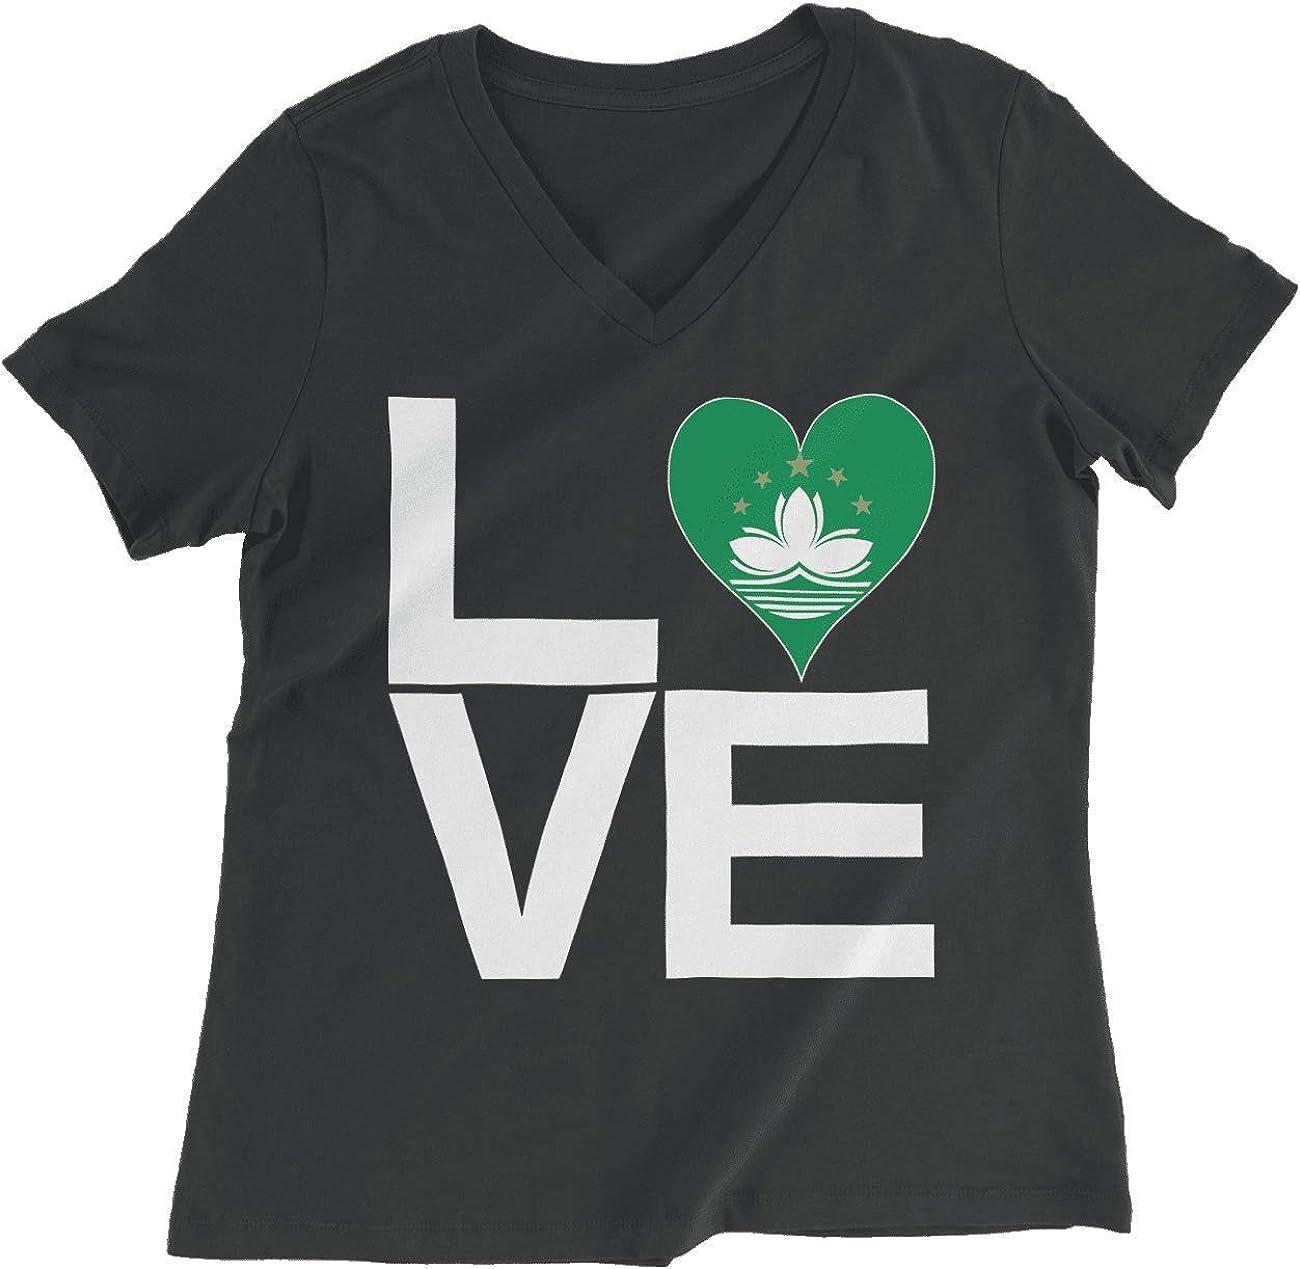 HARD EDGE DESIGN Women's Love Block Macau Heart T-Shirt